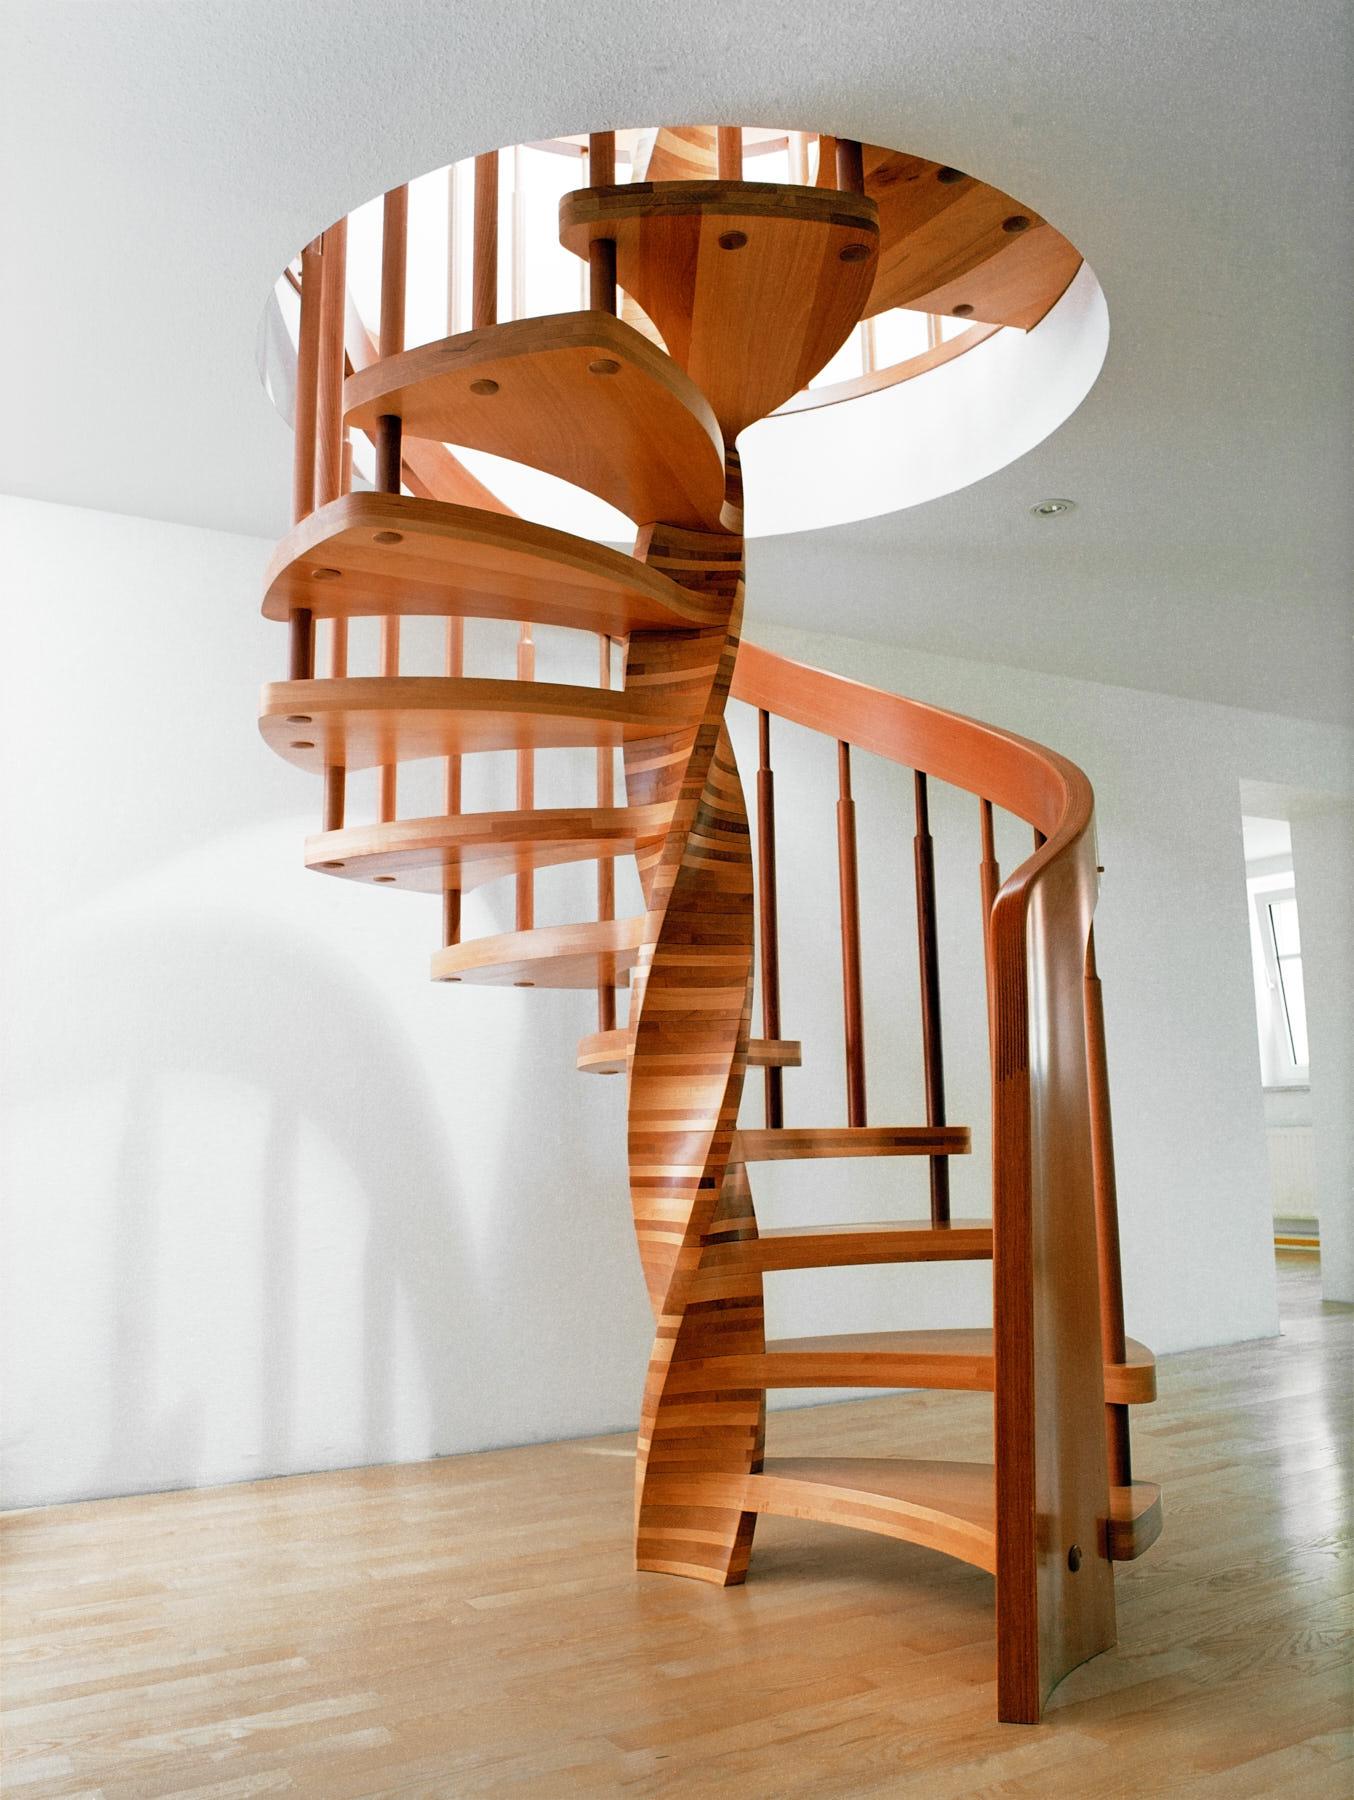 spindeltreppe-aus-buchenholz